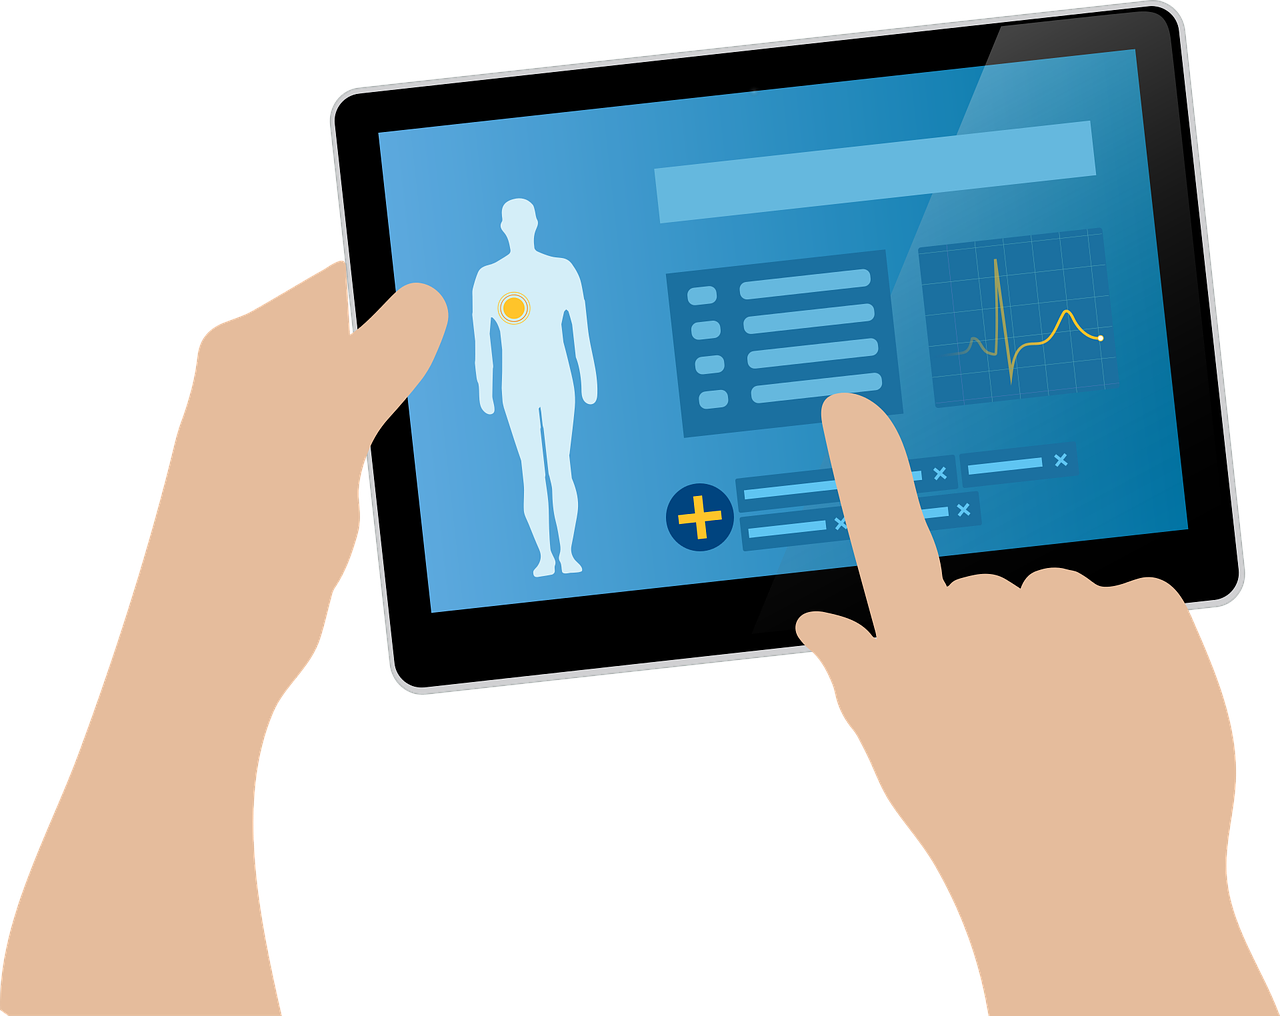 F:\Sohel\Brett\technologyrivers.com\Satya articles\images\My Mobile Health App.png